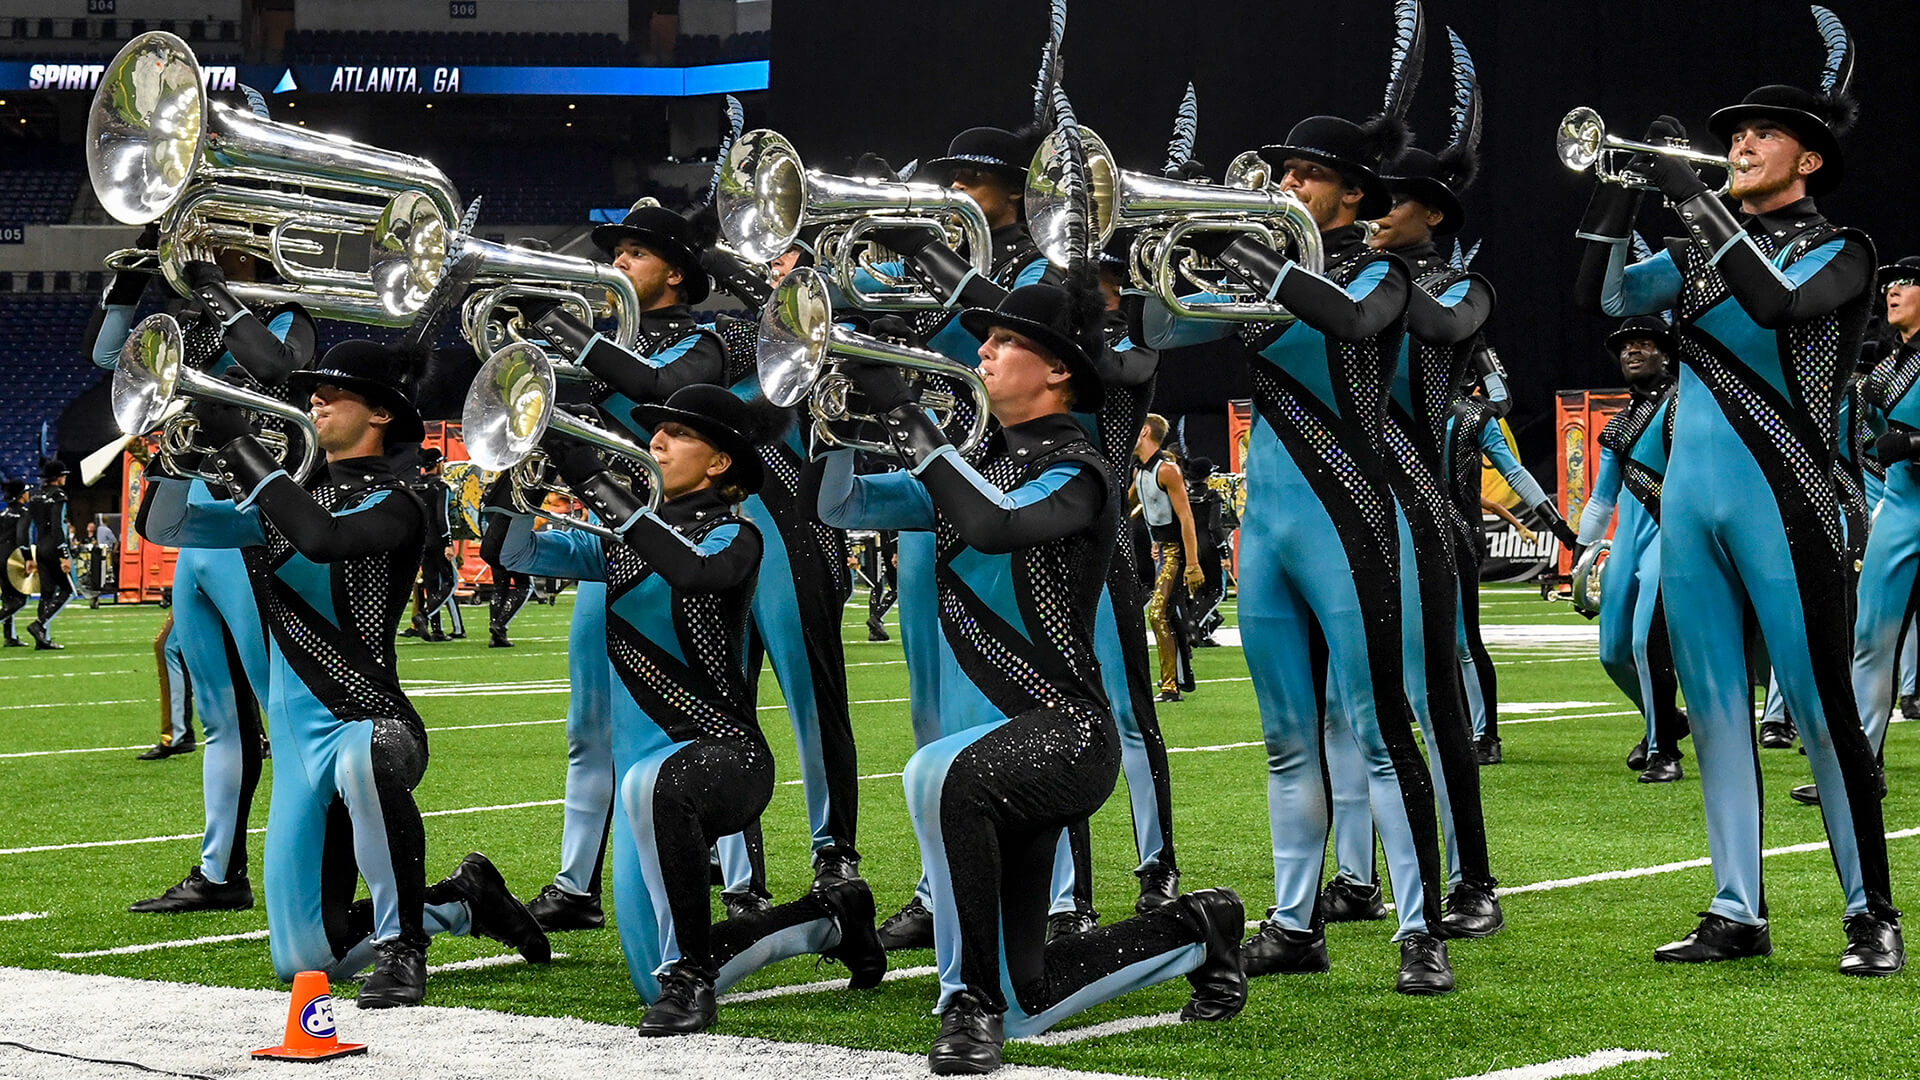 2018 Spirit of Atlanta